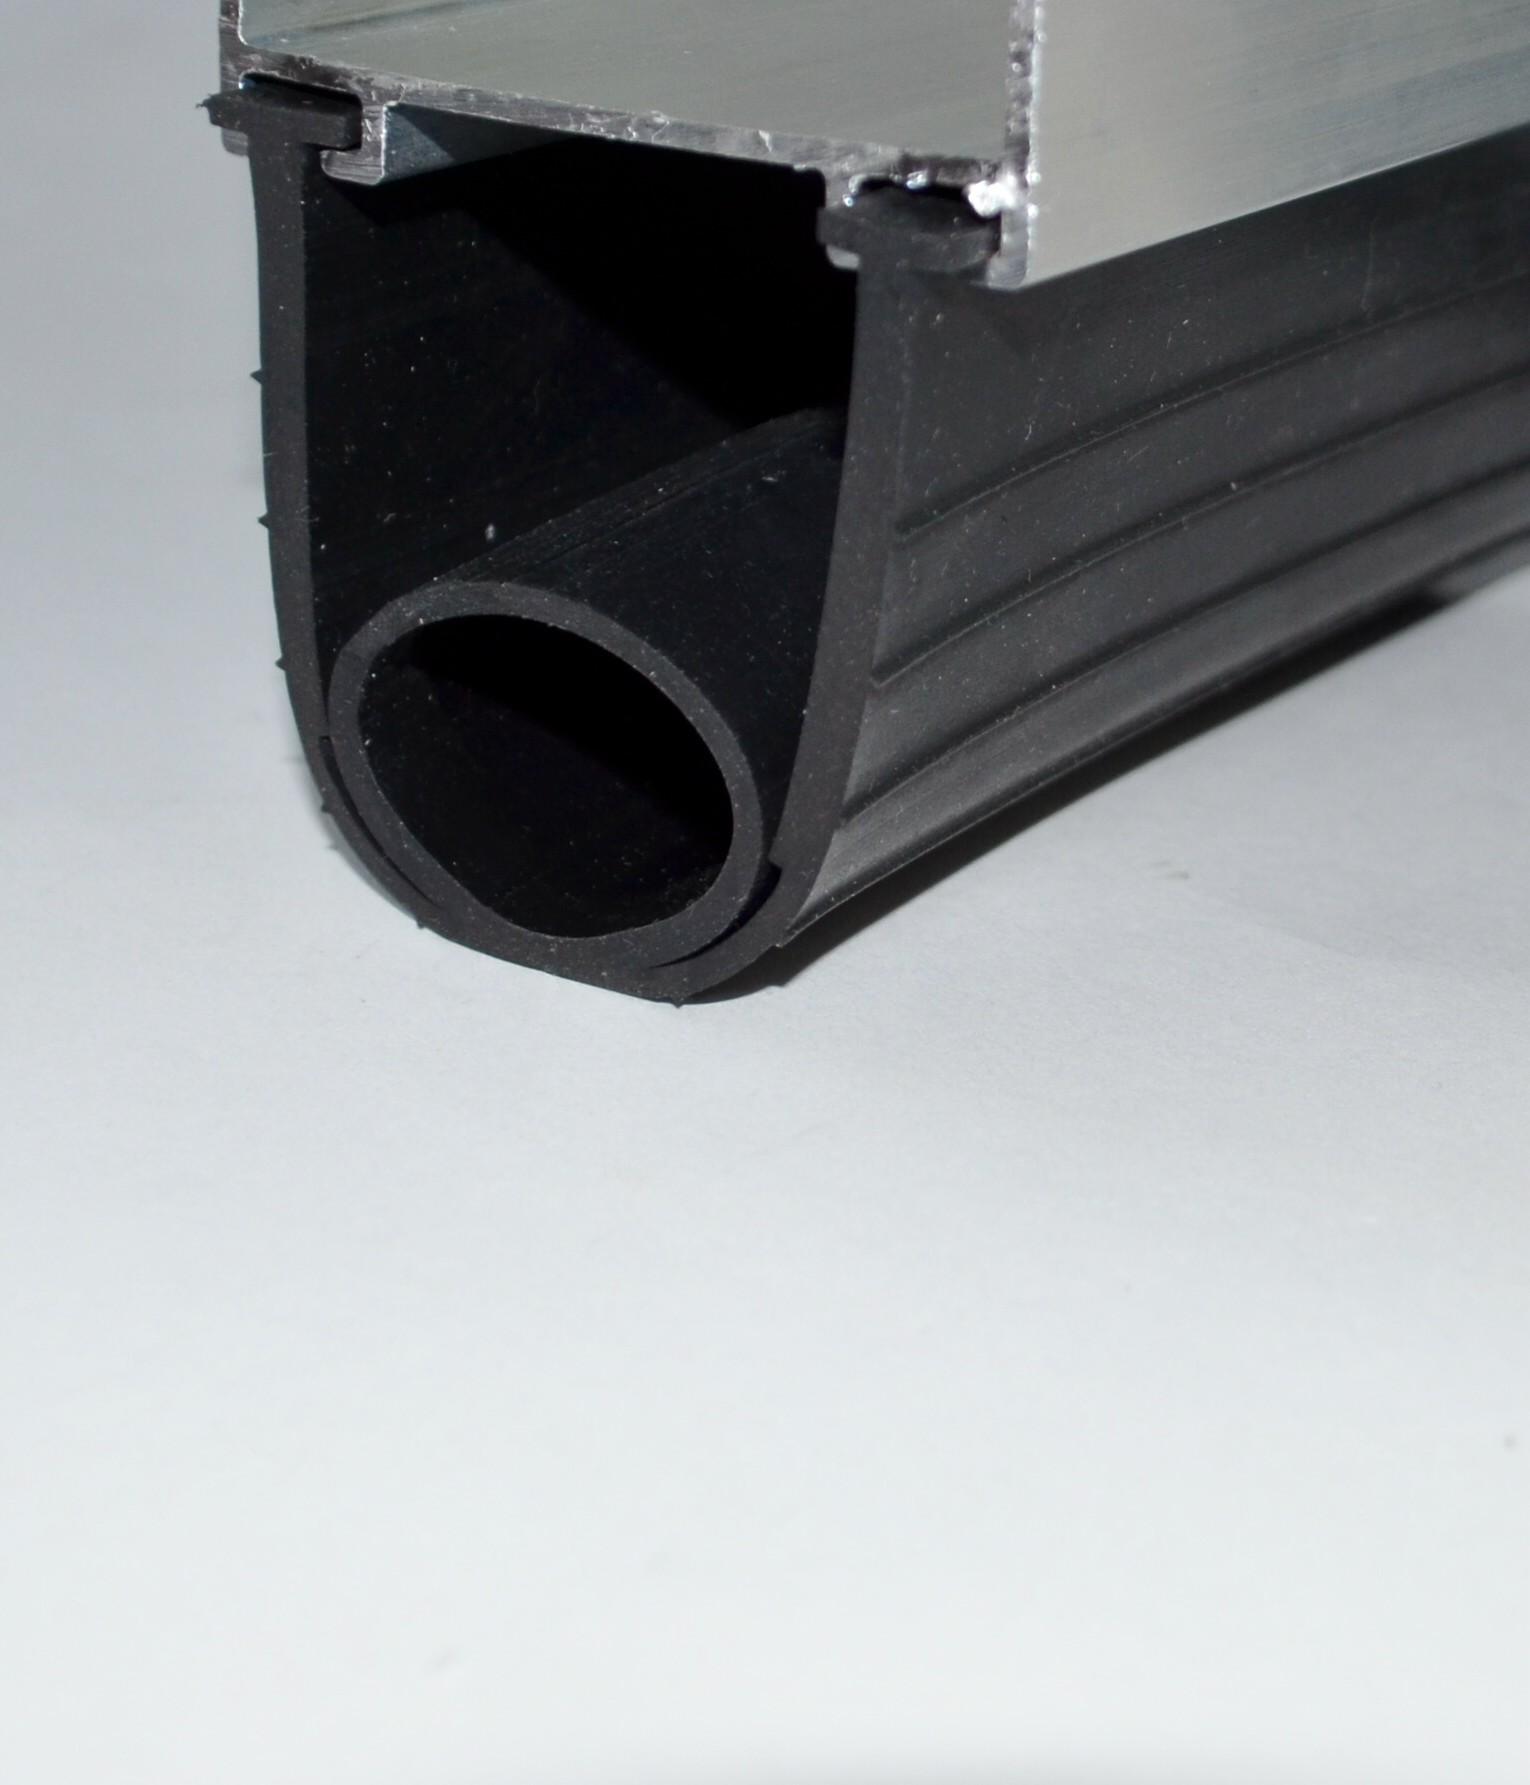 ... Seal Krete Floor Tex Home Depot By Garage Design Brilliant Sealing  Garage Floor Coatings Sealing ...